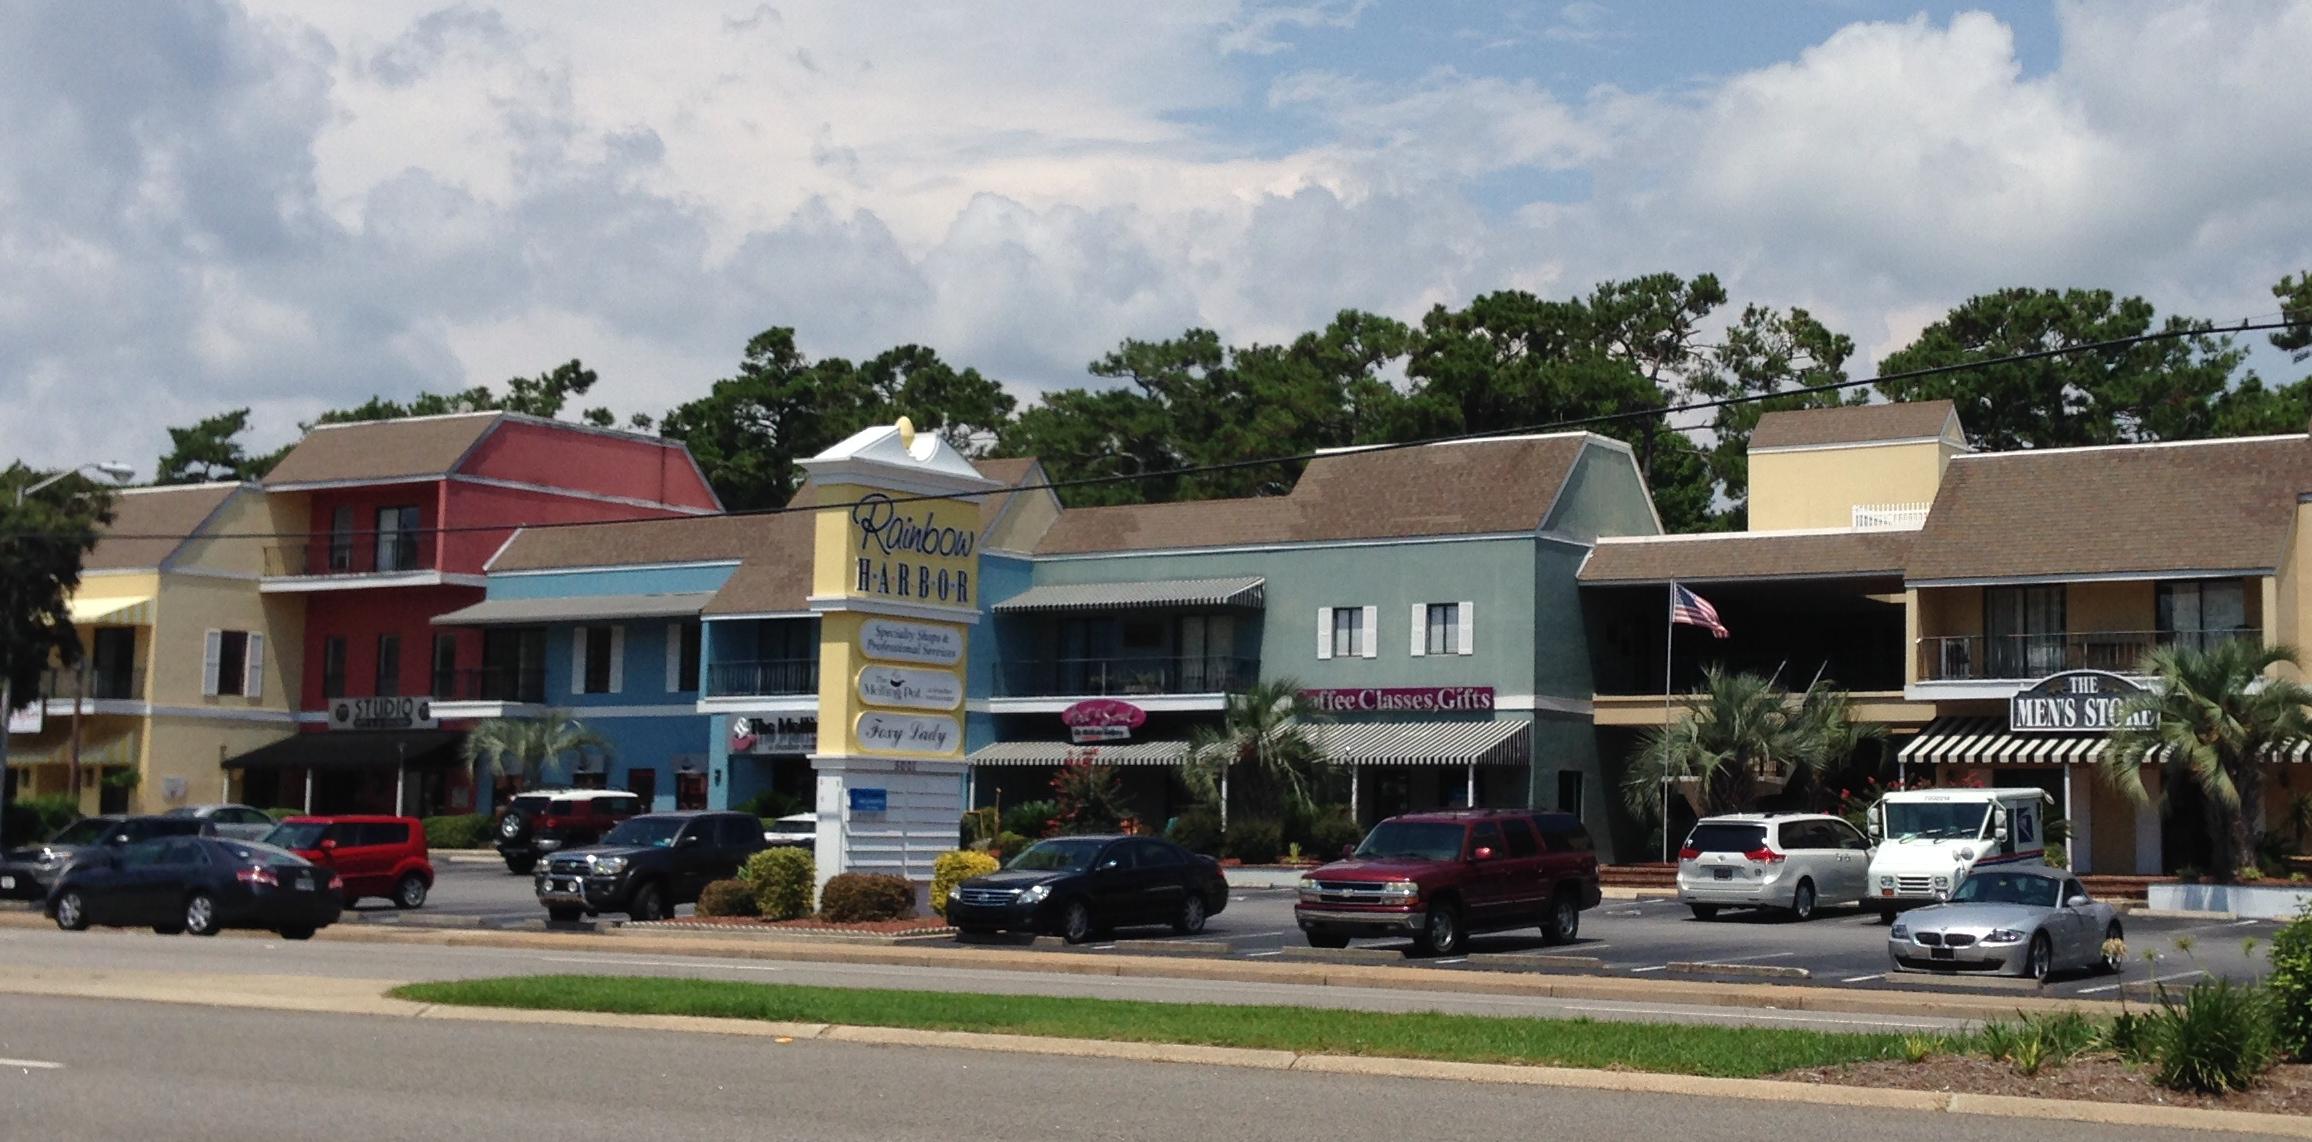 5001 North Kings Highway,Myrtle Beach,South Carolina,29577,Retail / Restaurant,Rainbow Harbor,North Kings Highway,1237